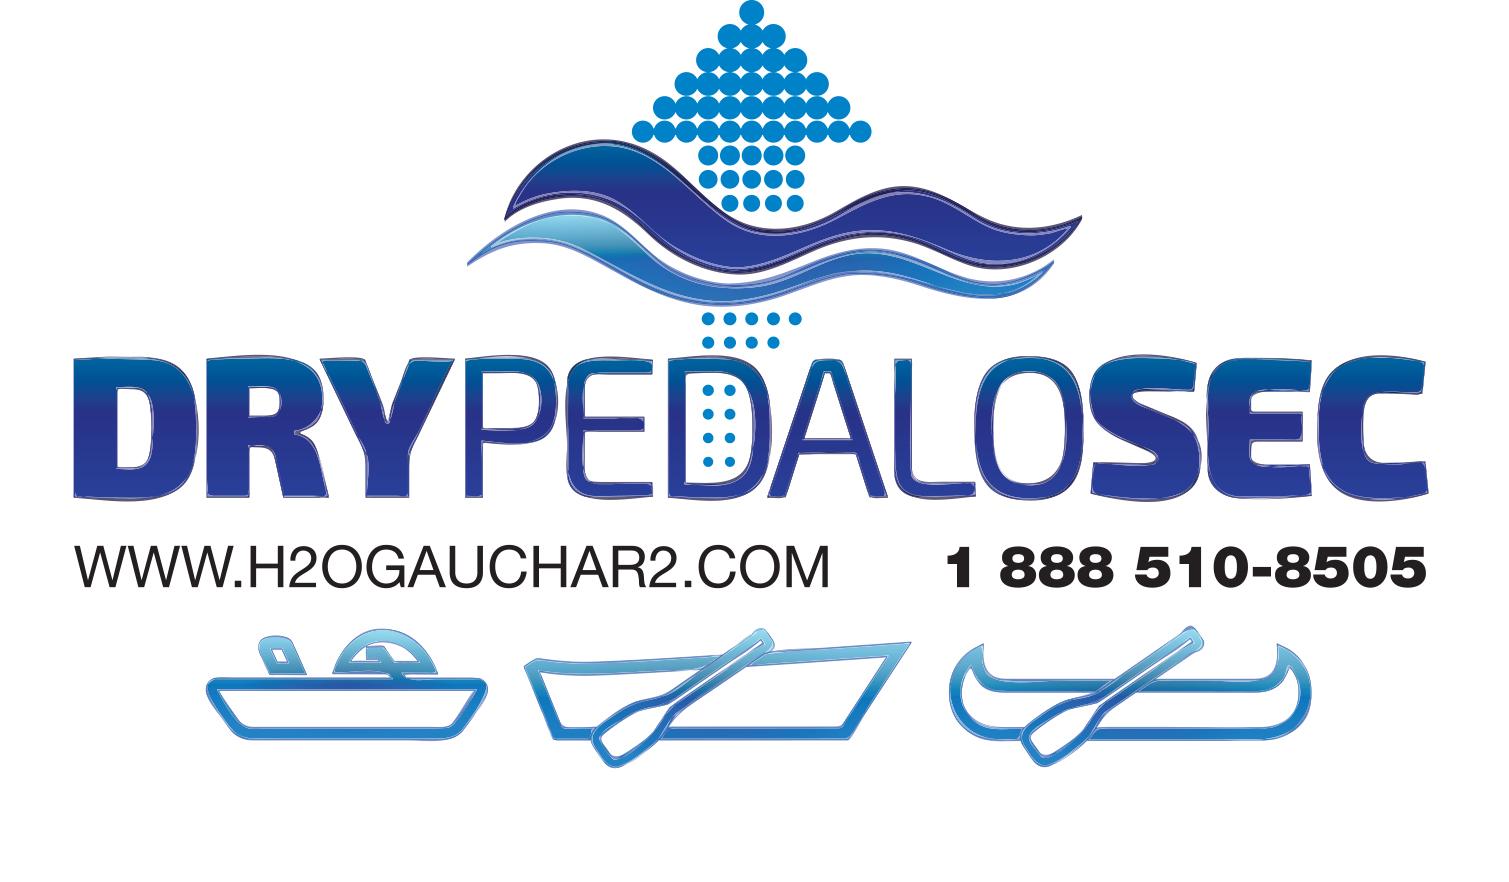 logo_PEDALOSEC_diff_embarcations_icones